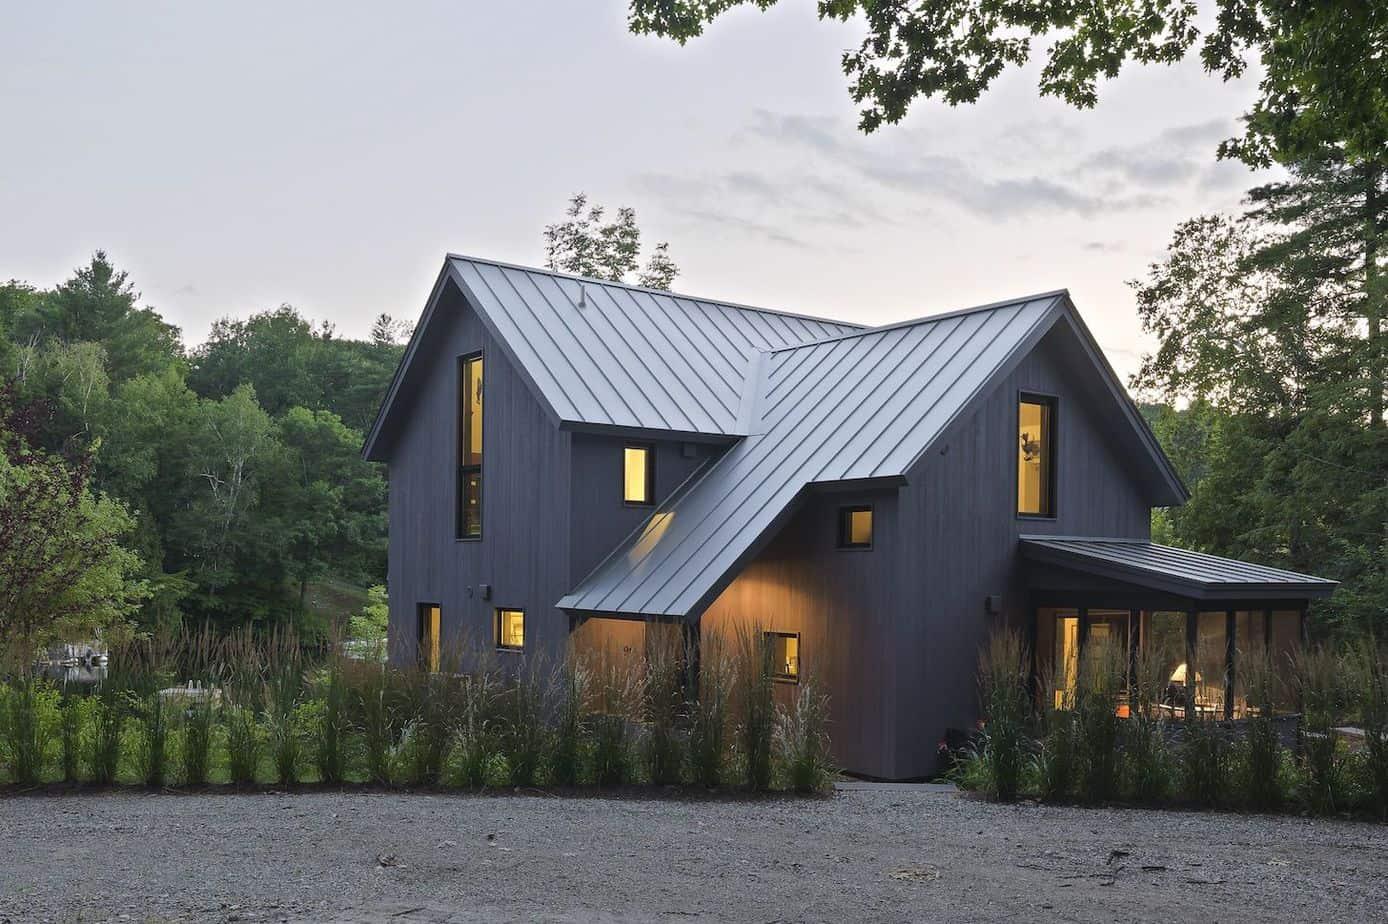 Modern Scandinavian house exterior paint colors 2021 charcoal grey